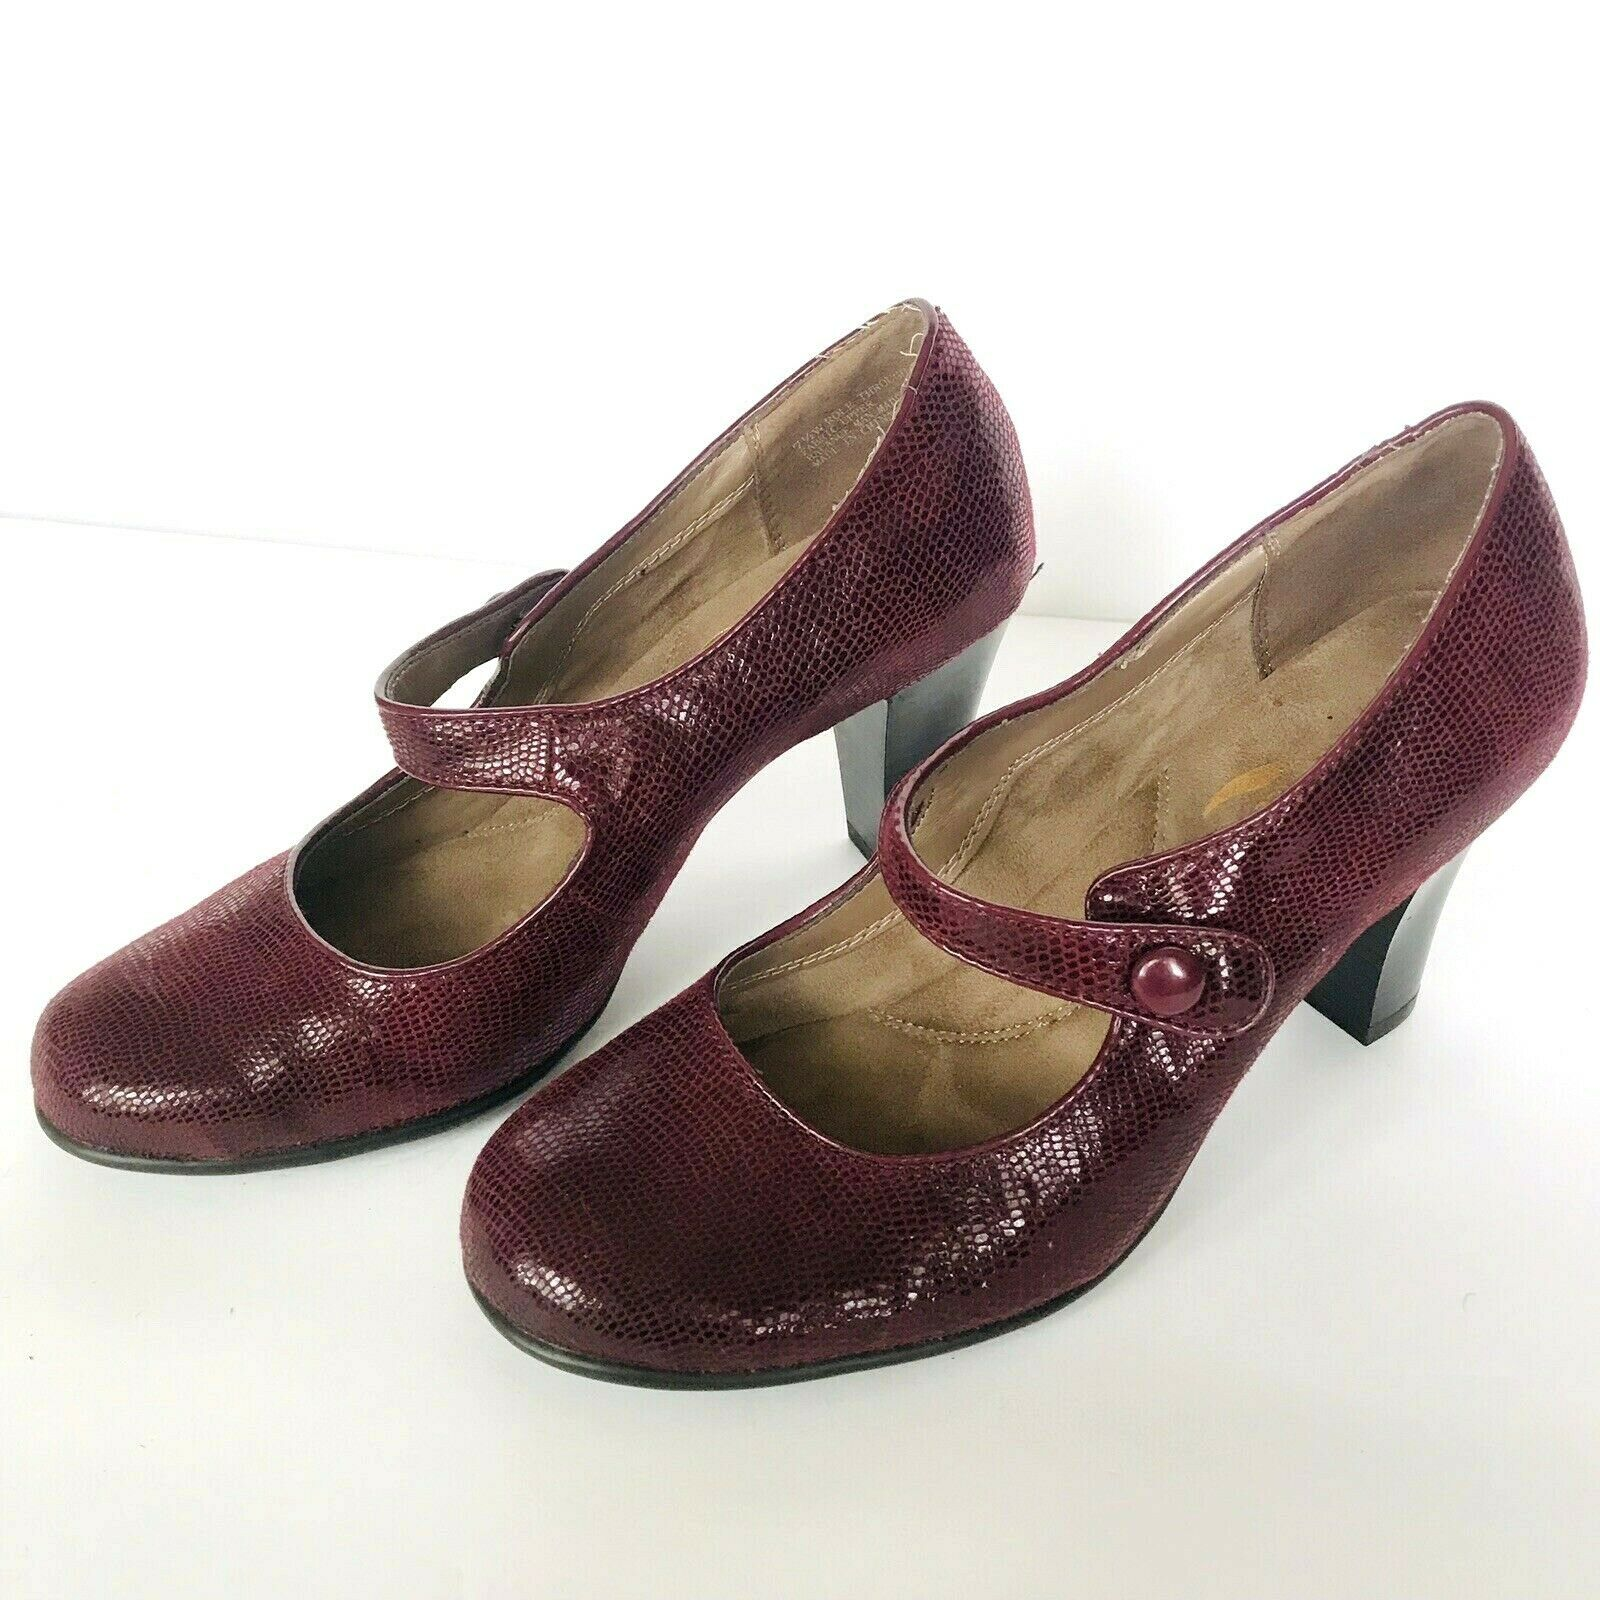 Aerosoles heelrest Bourgogne du LOGO en cuir Mary Jane Talons chaussures Femme 8